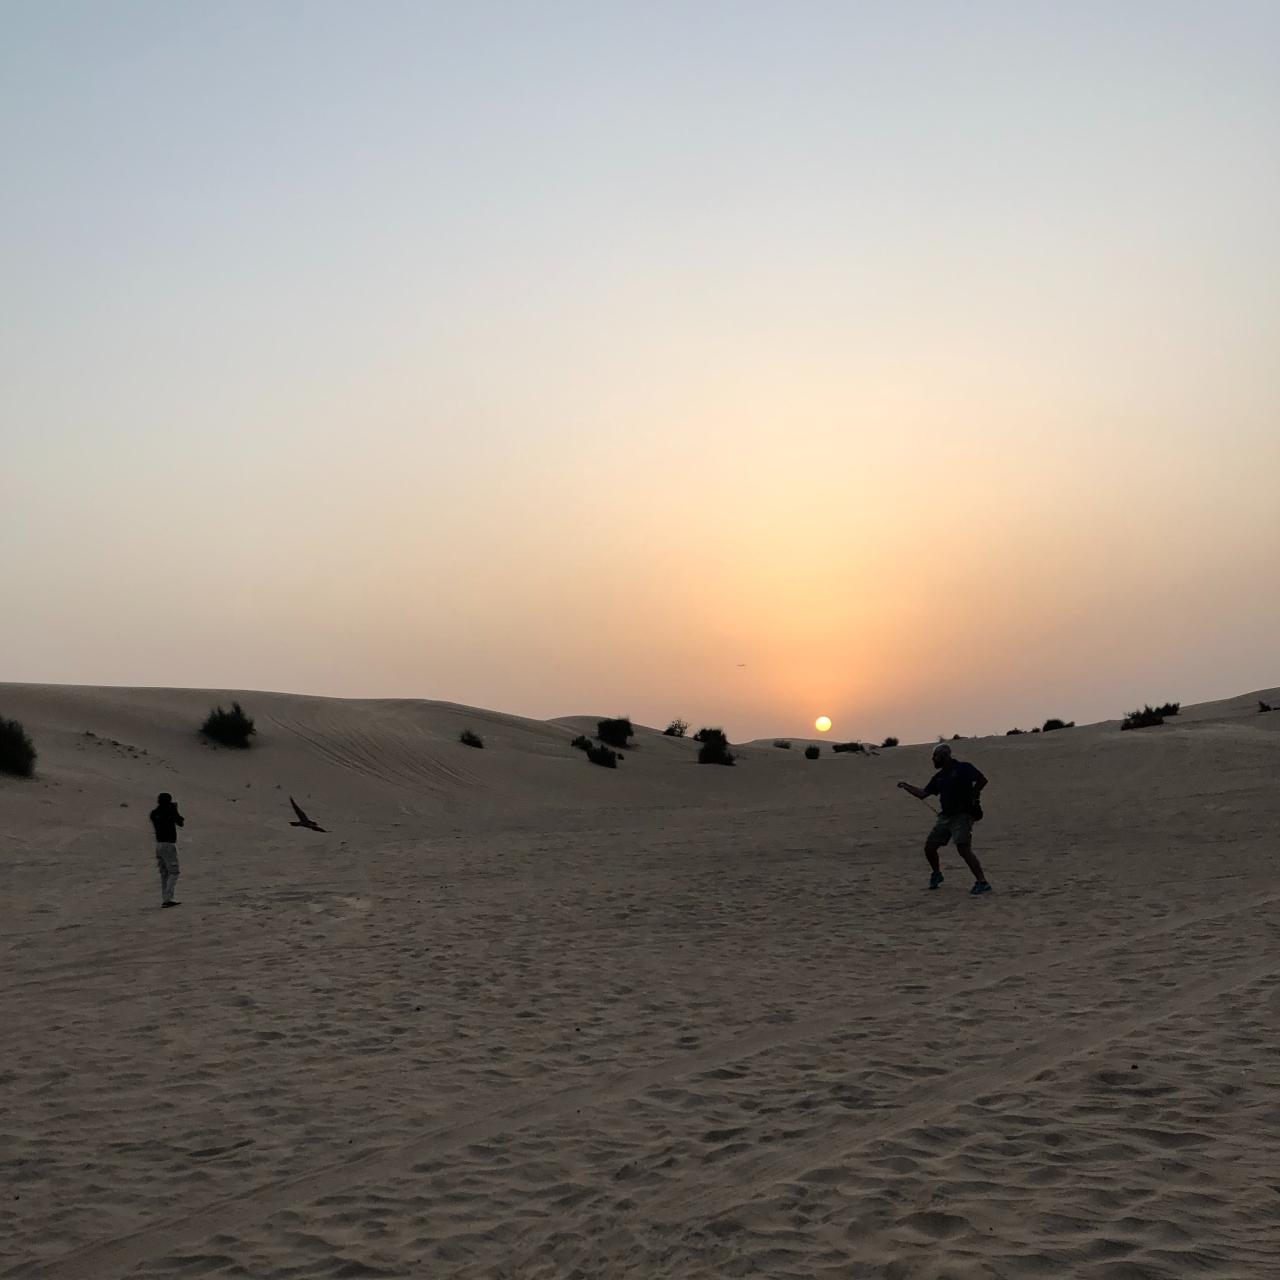 Sunset falconry Dubai desert